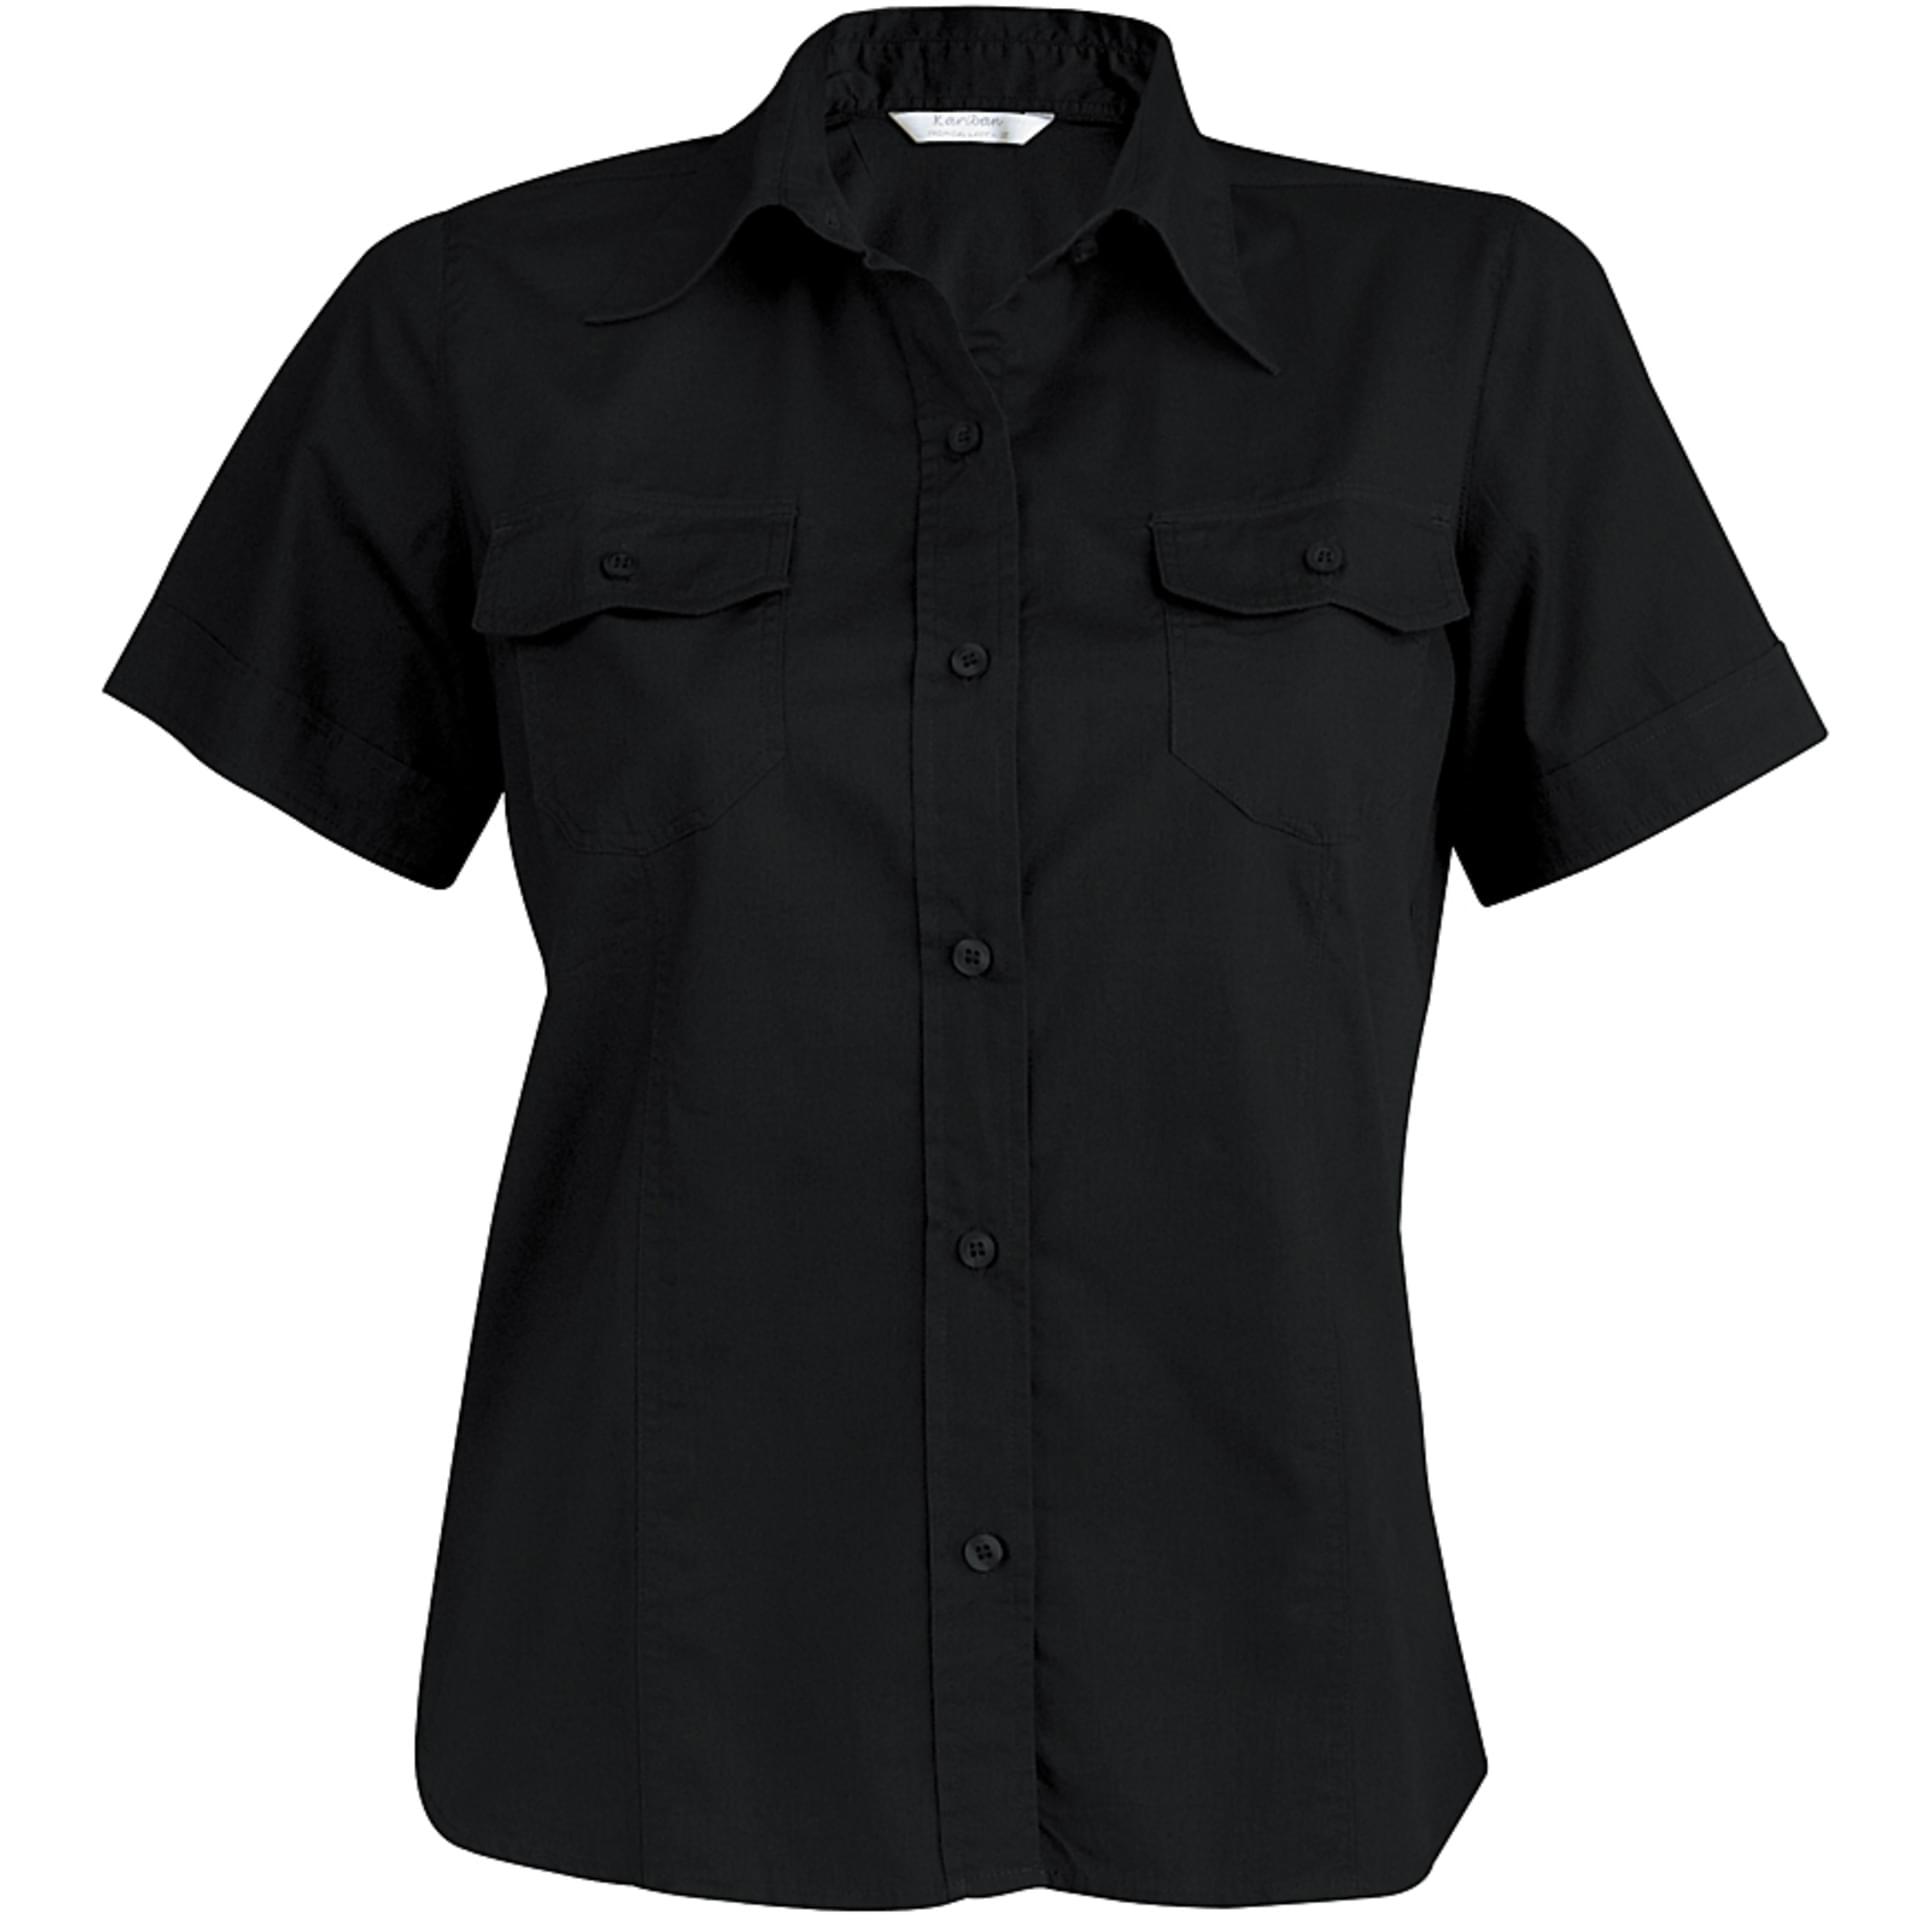 chemise personnalis e chemise femme manches courtes cintr e tropical ladies kariban kariban black. Black Bedroom Furniture Sets. Home Design Ideas